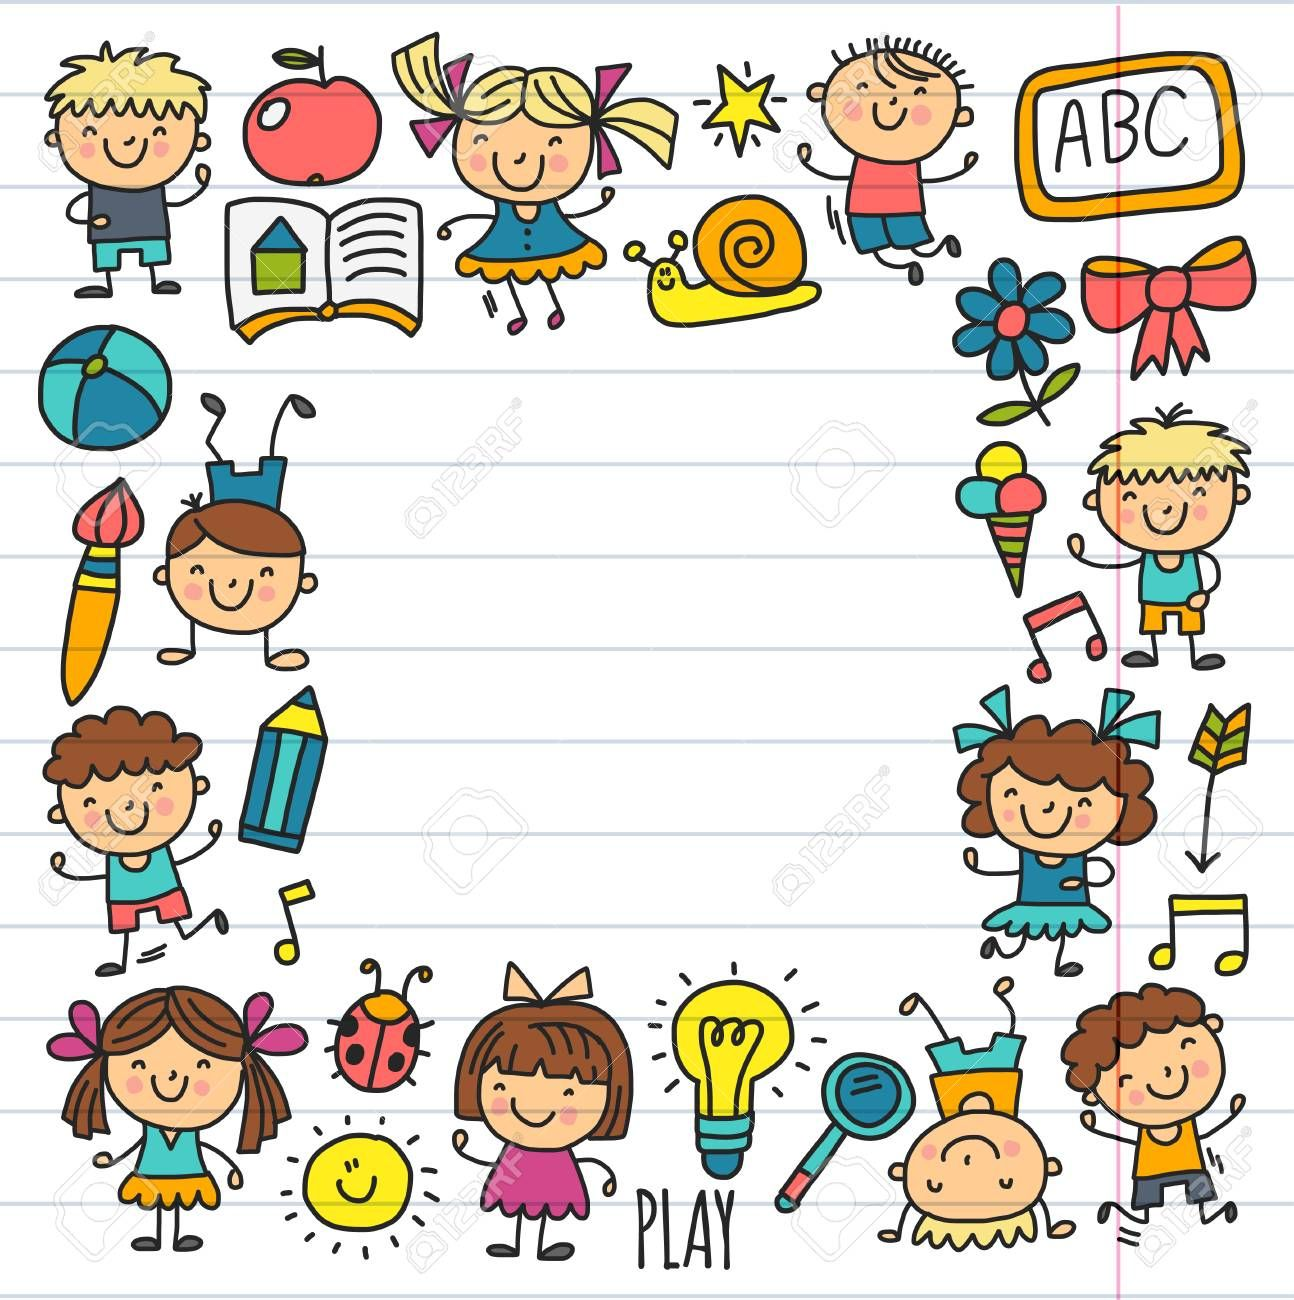 Seamless Pattern Kids Drawing Kindergarten School Happy Children Play Illustration For Kids Nursery Presch Drawing For Kids Nursery Preschool Preschool Kids